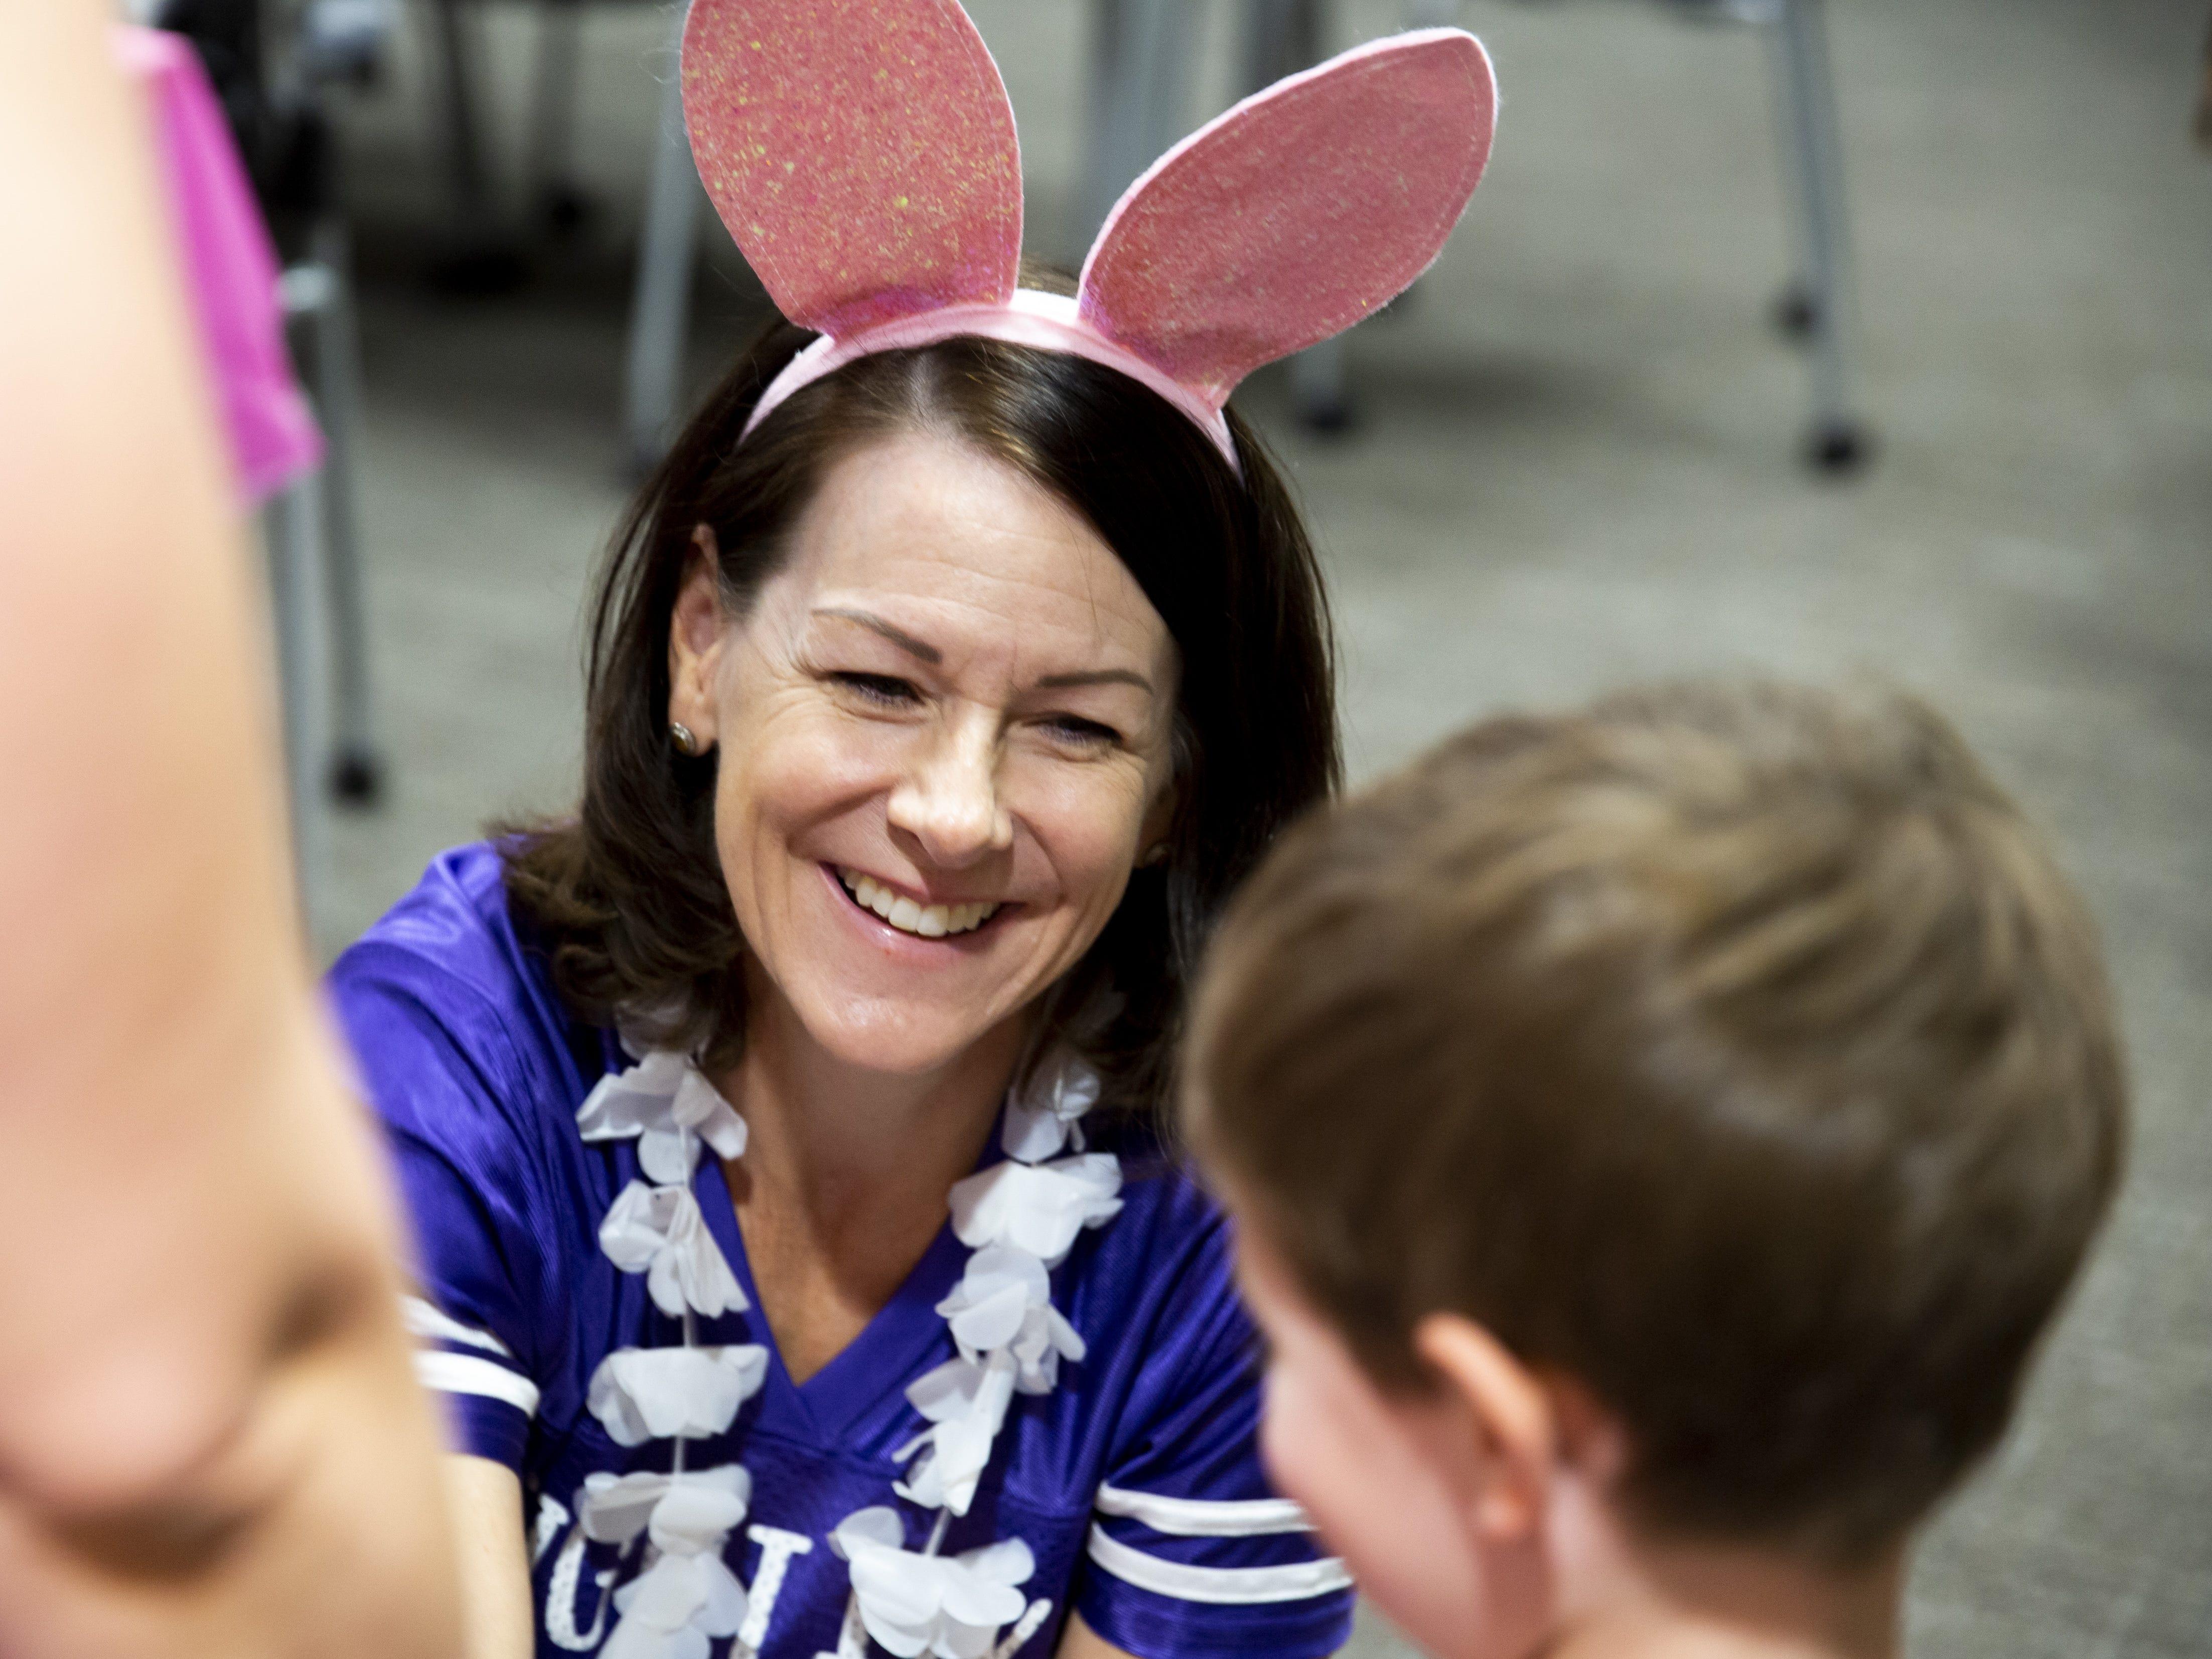 Registered nurse Kirsten Phillips greets children at the Preemie NICU Reunion at Banner University Medical Center on April 13, 2019.